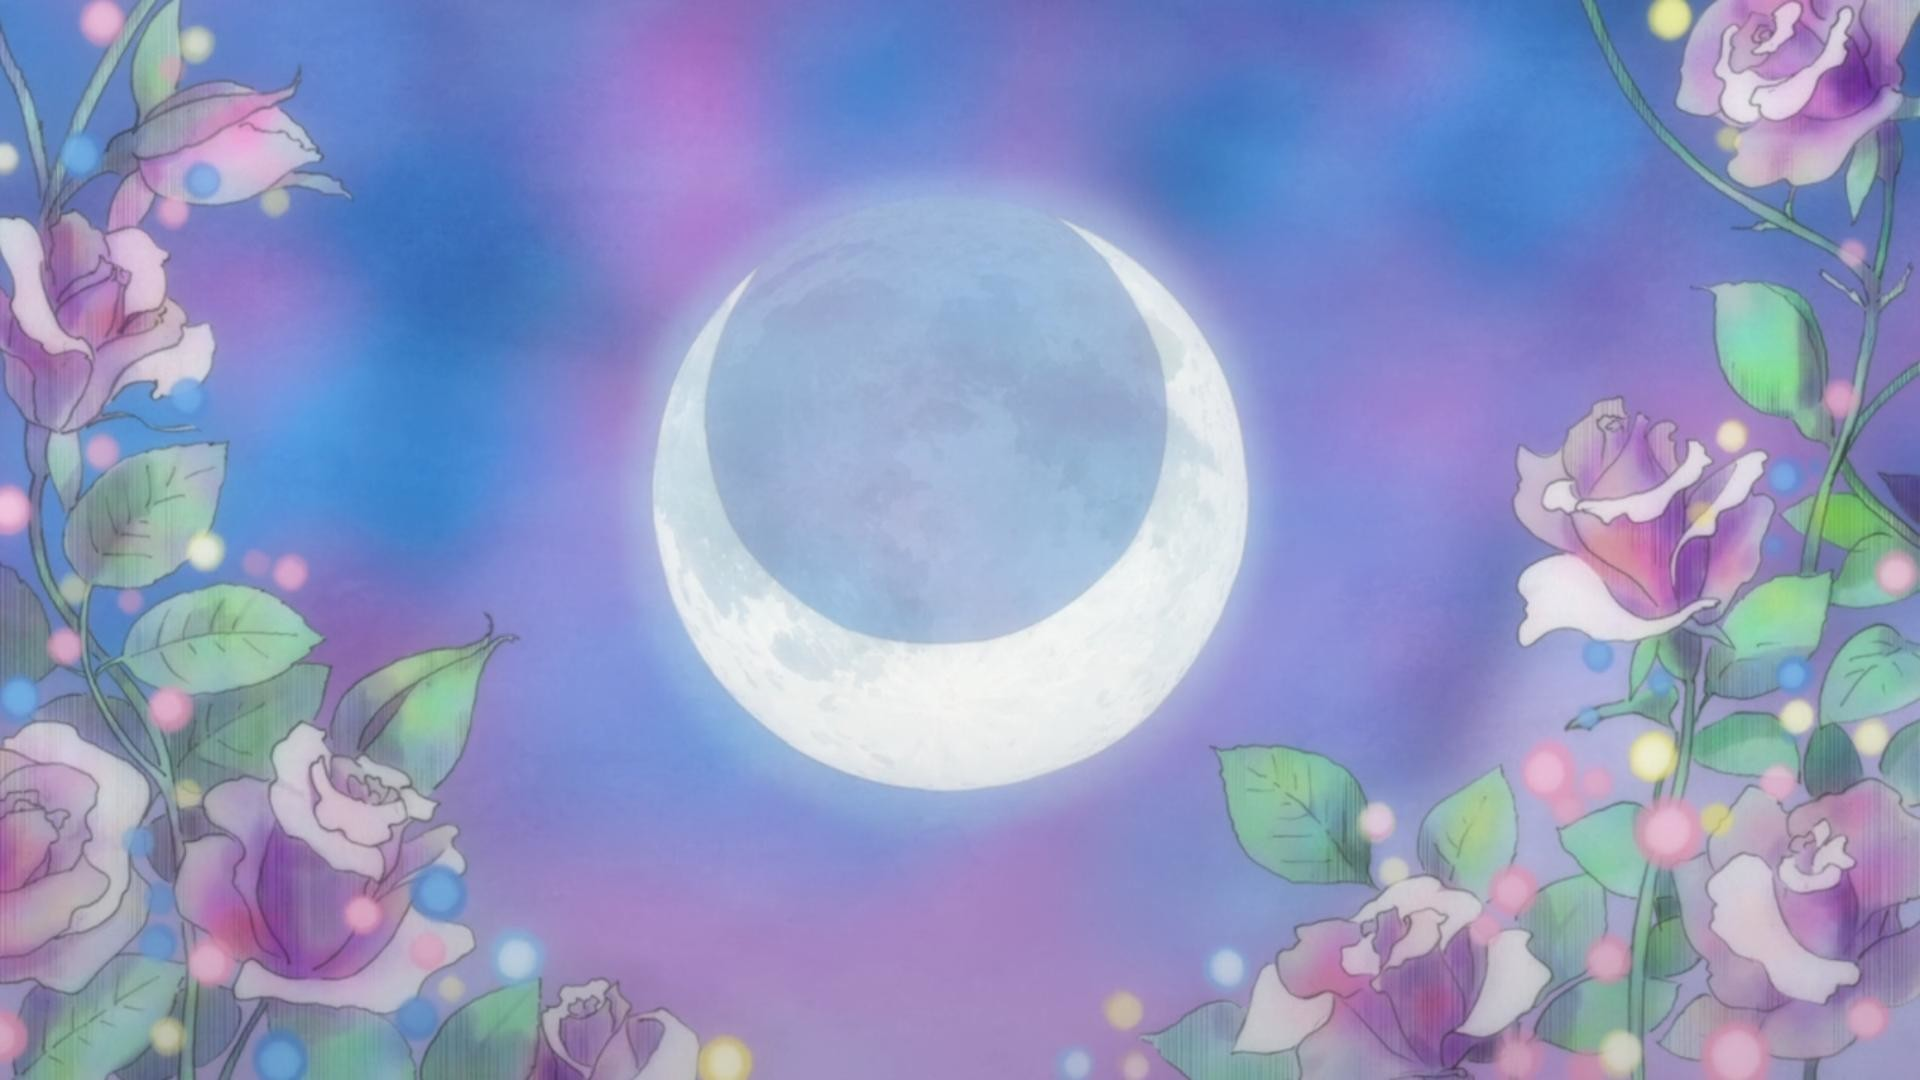 Sailor Moon Backgrounds – Wallpaper Cave